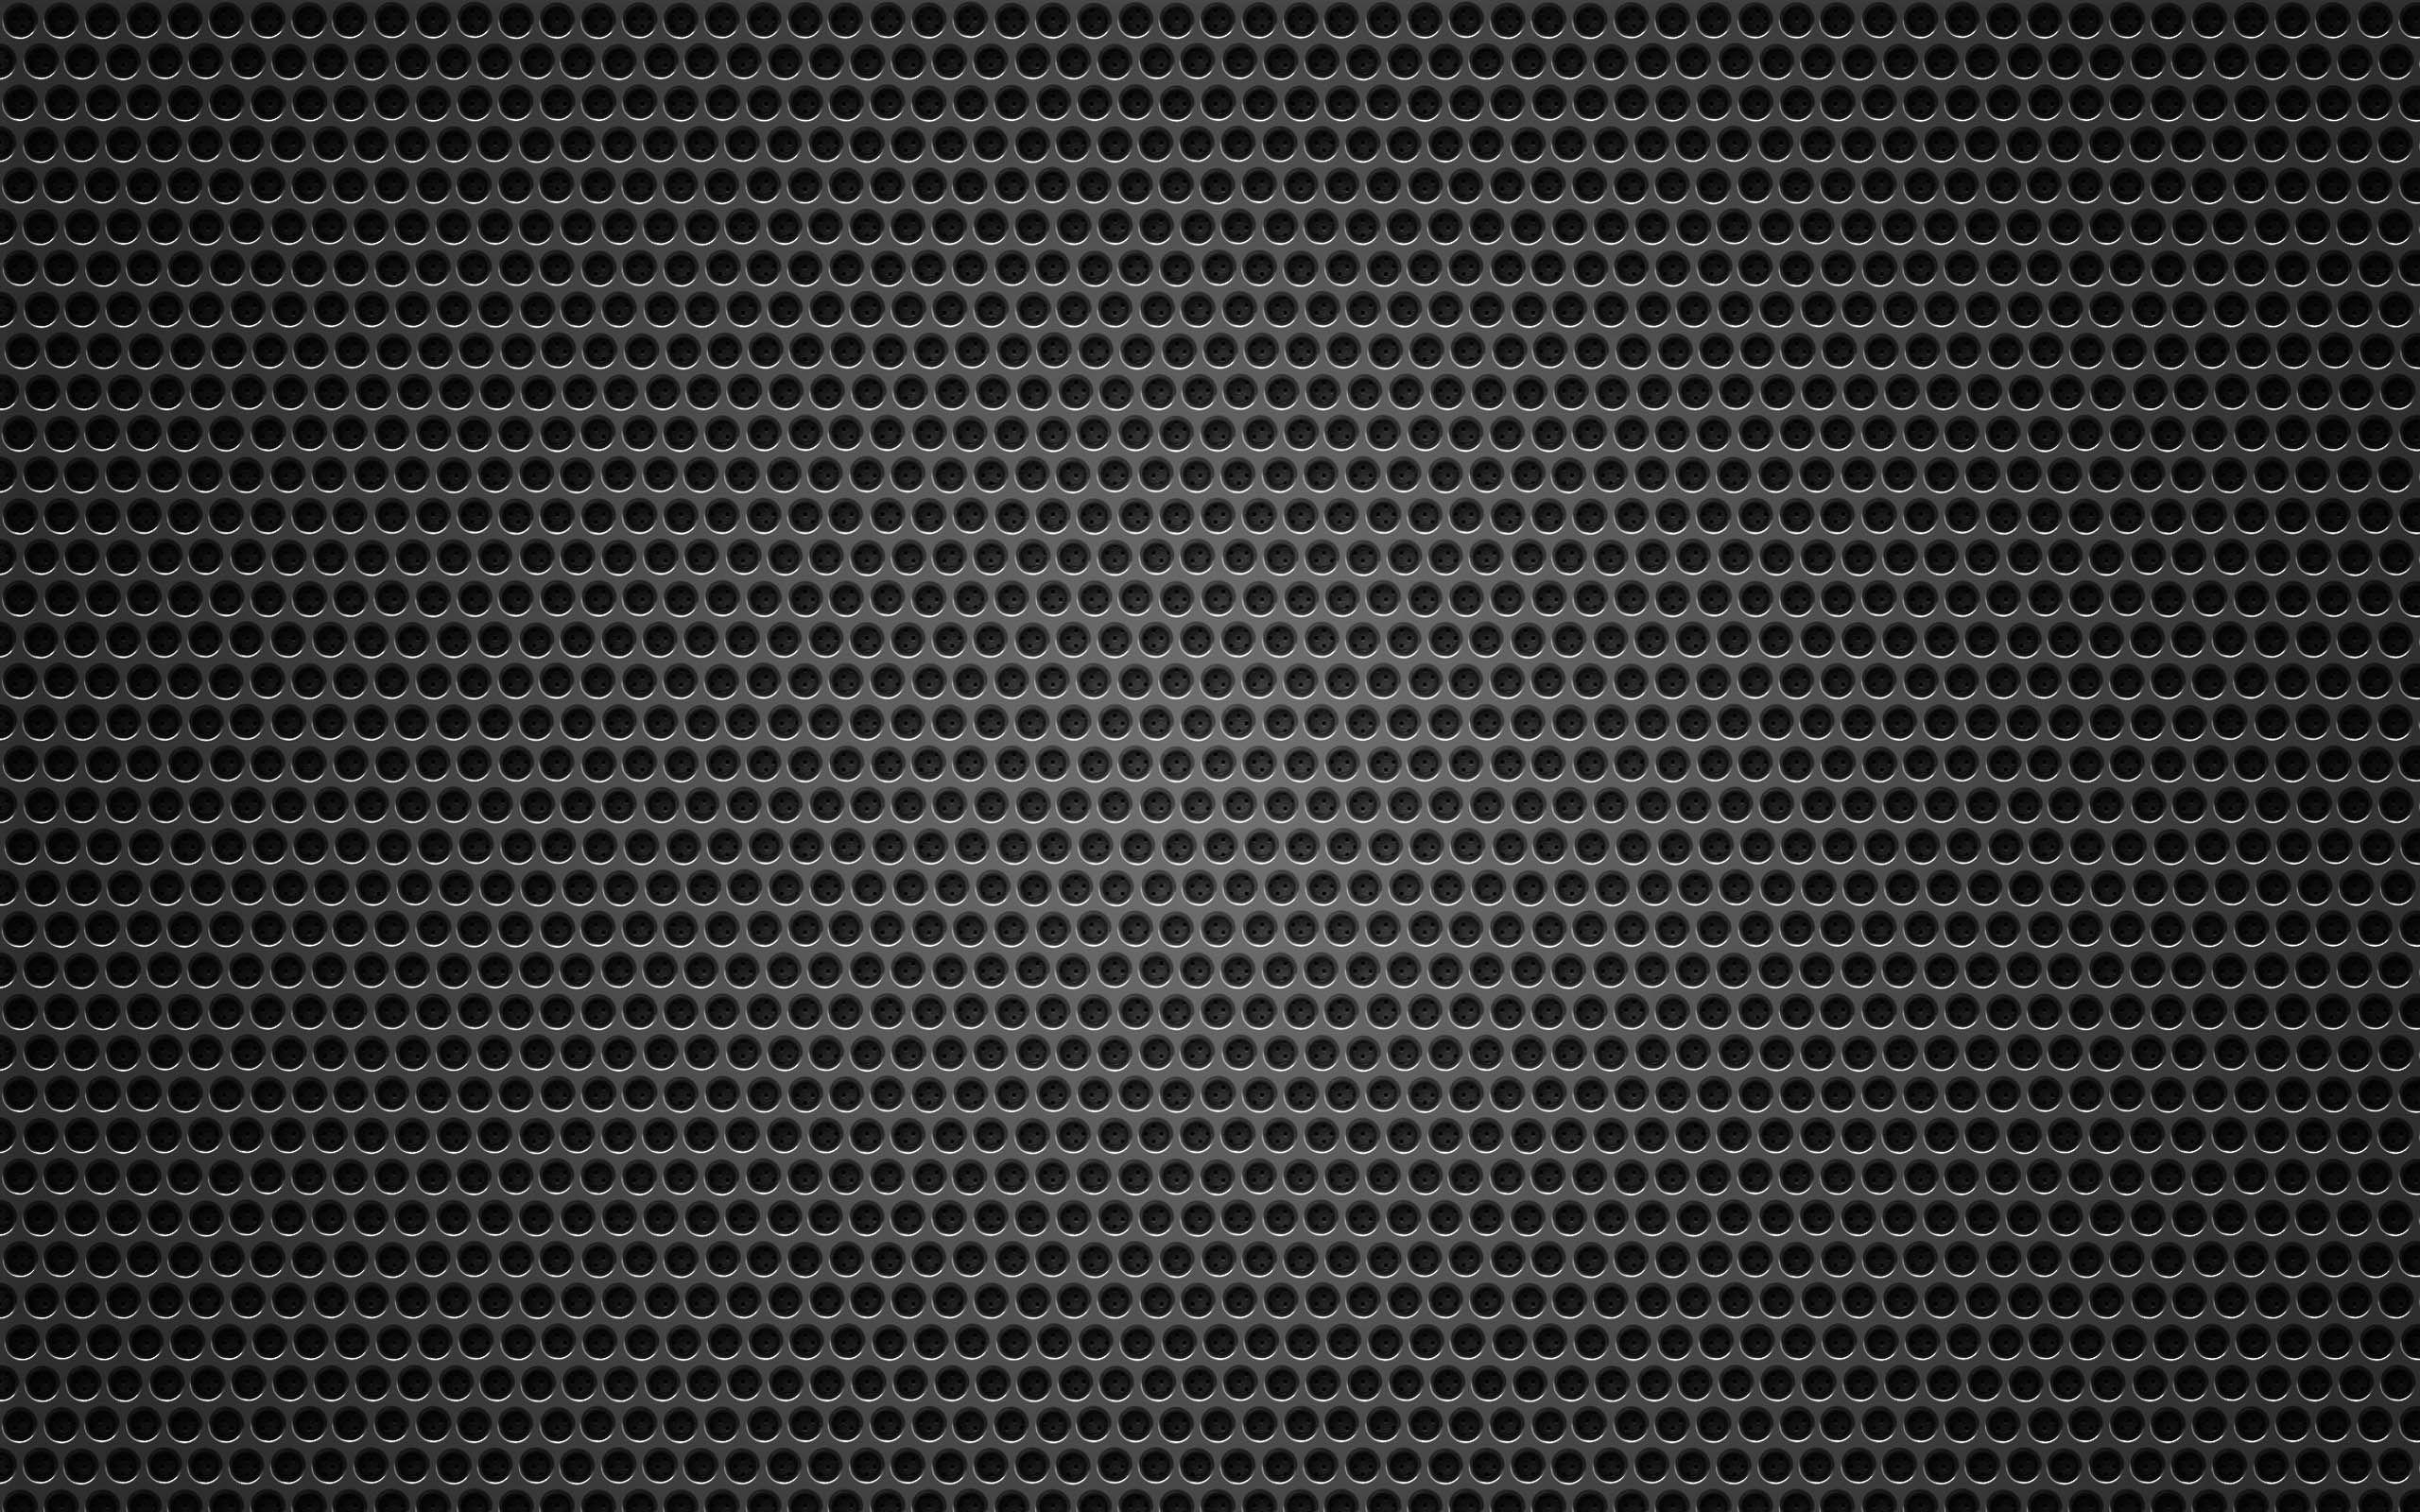 2560x1600px Black Background Image Dots | #313115